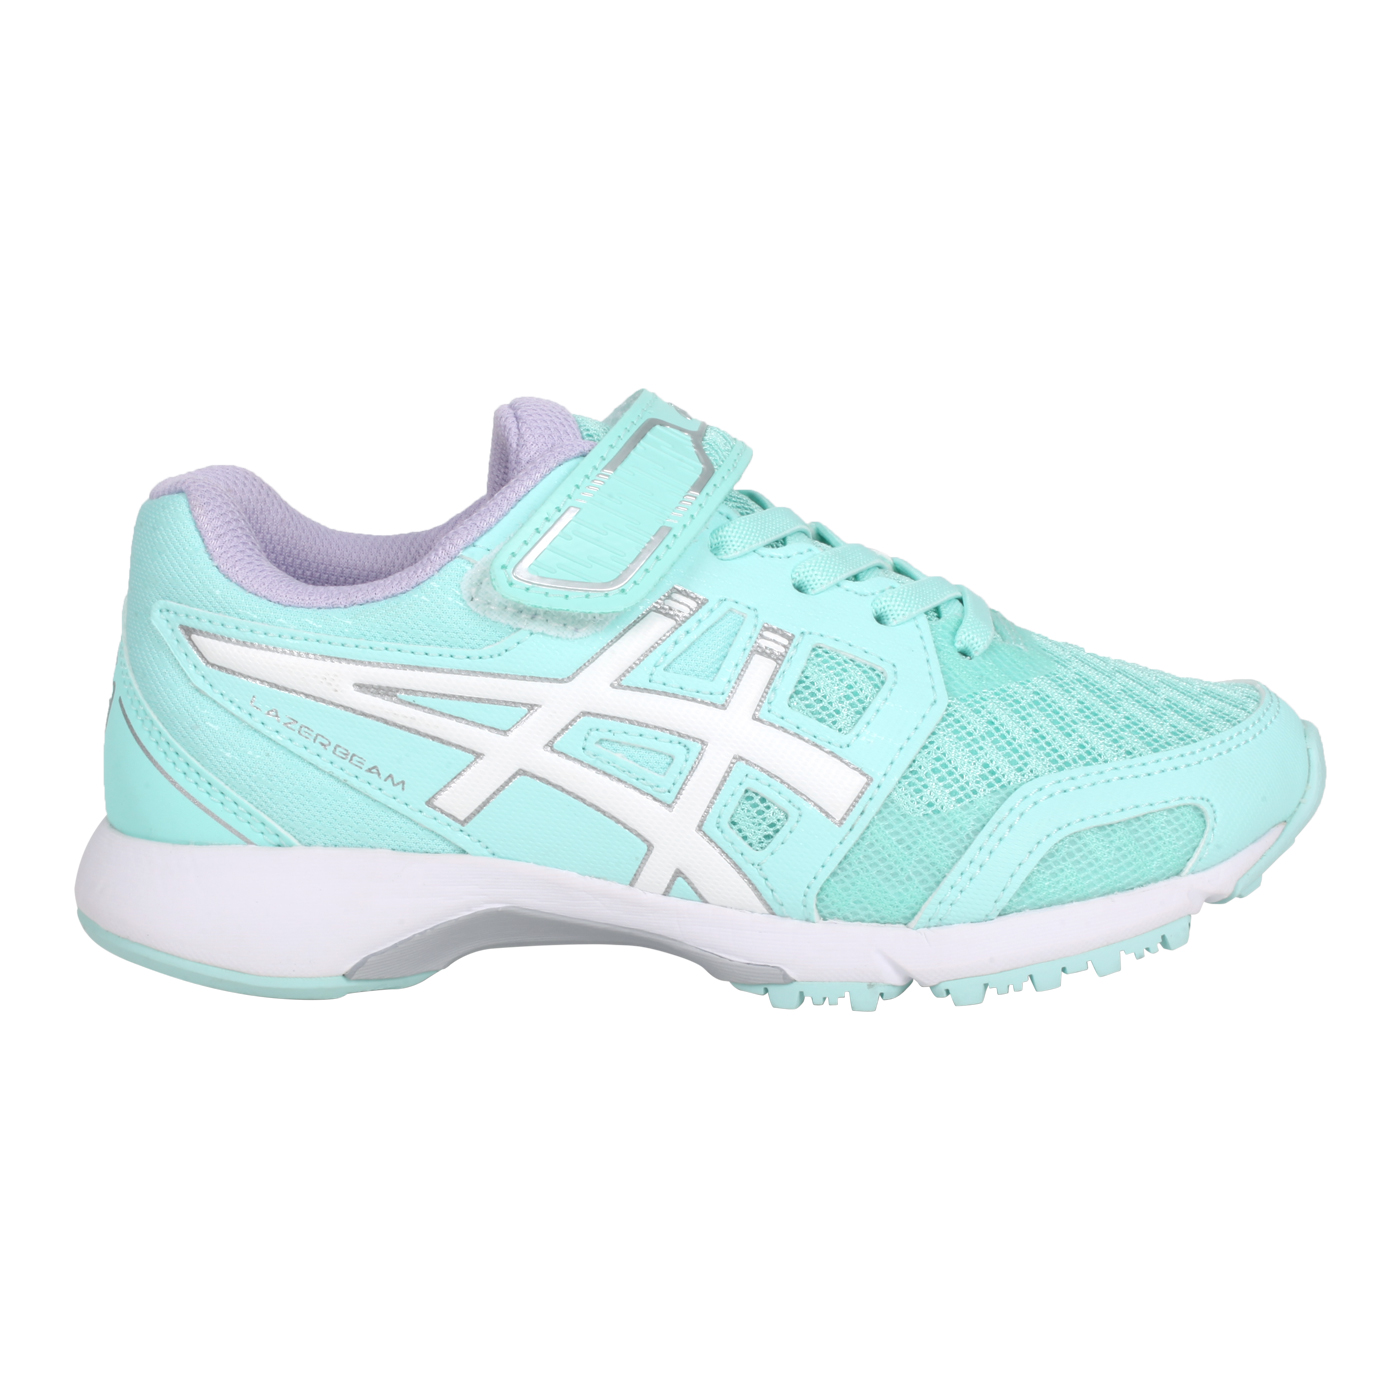 ASICS 中童運動鞋  @LAZERBEAM RF-MG@1154A088-403 - 湖水綠銀